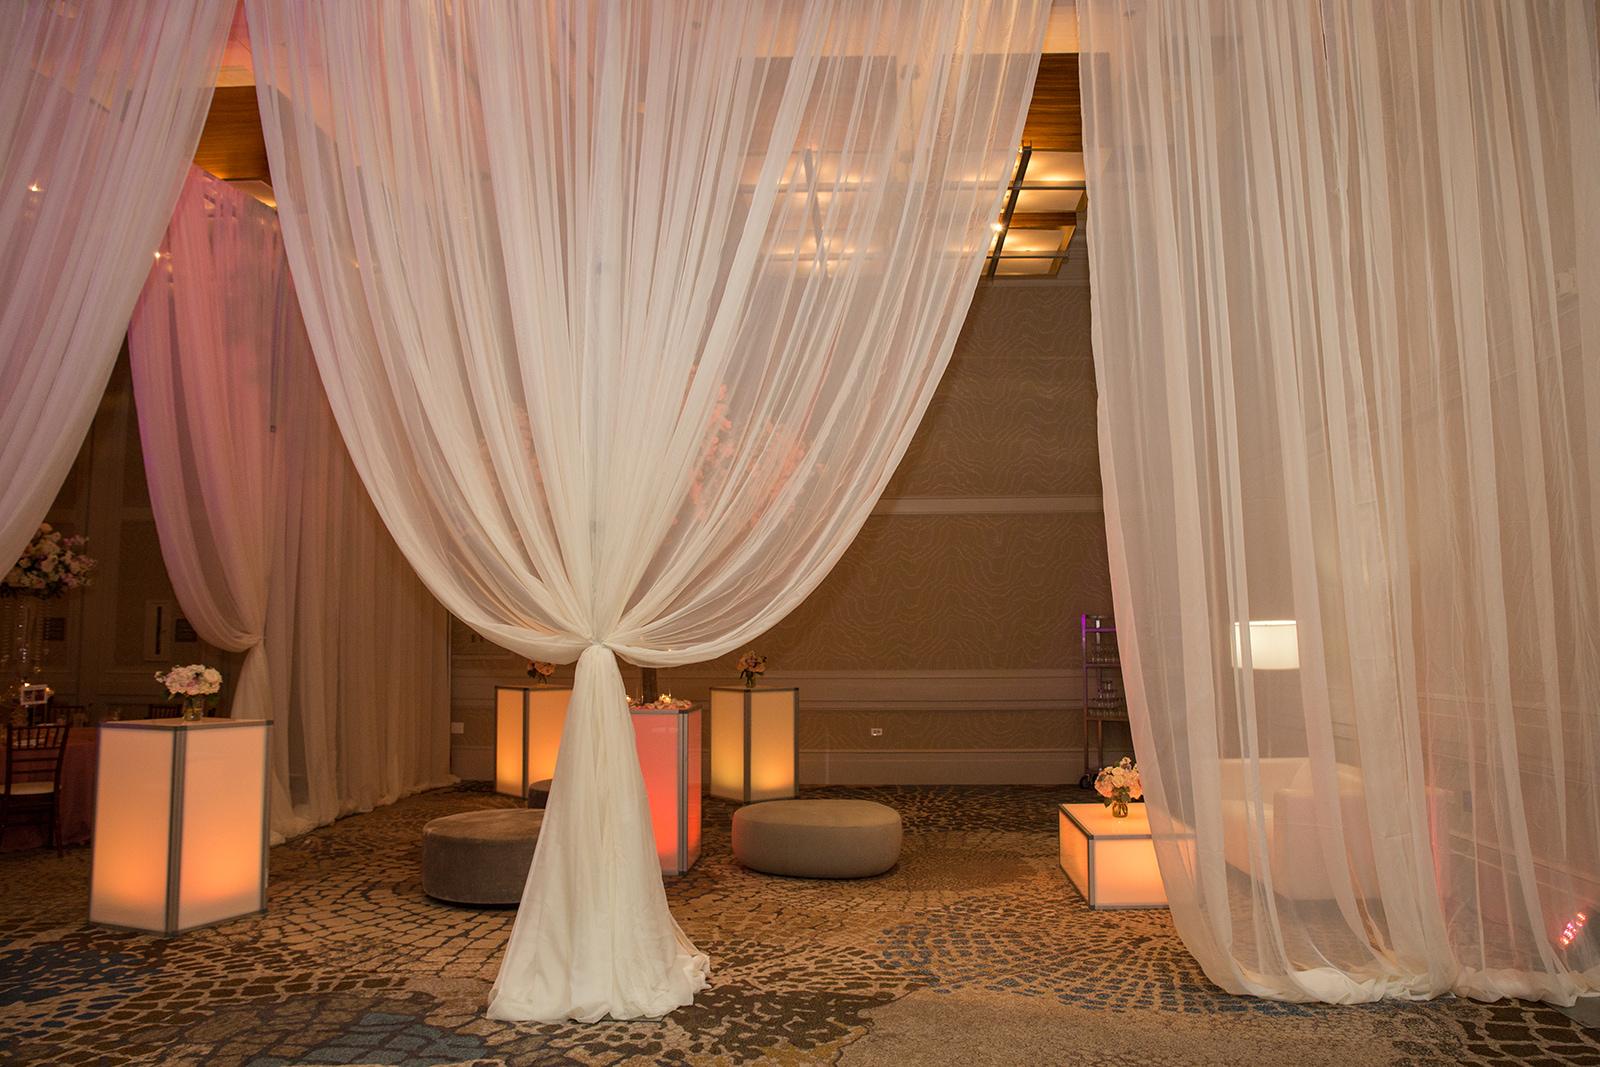 Le Cape Weddings - Sumeet and Chavi - Reception Details  -33.jpg